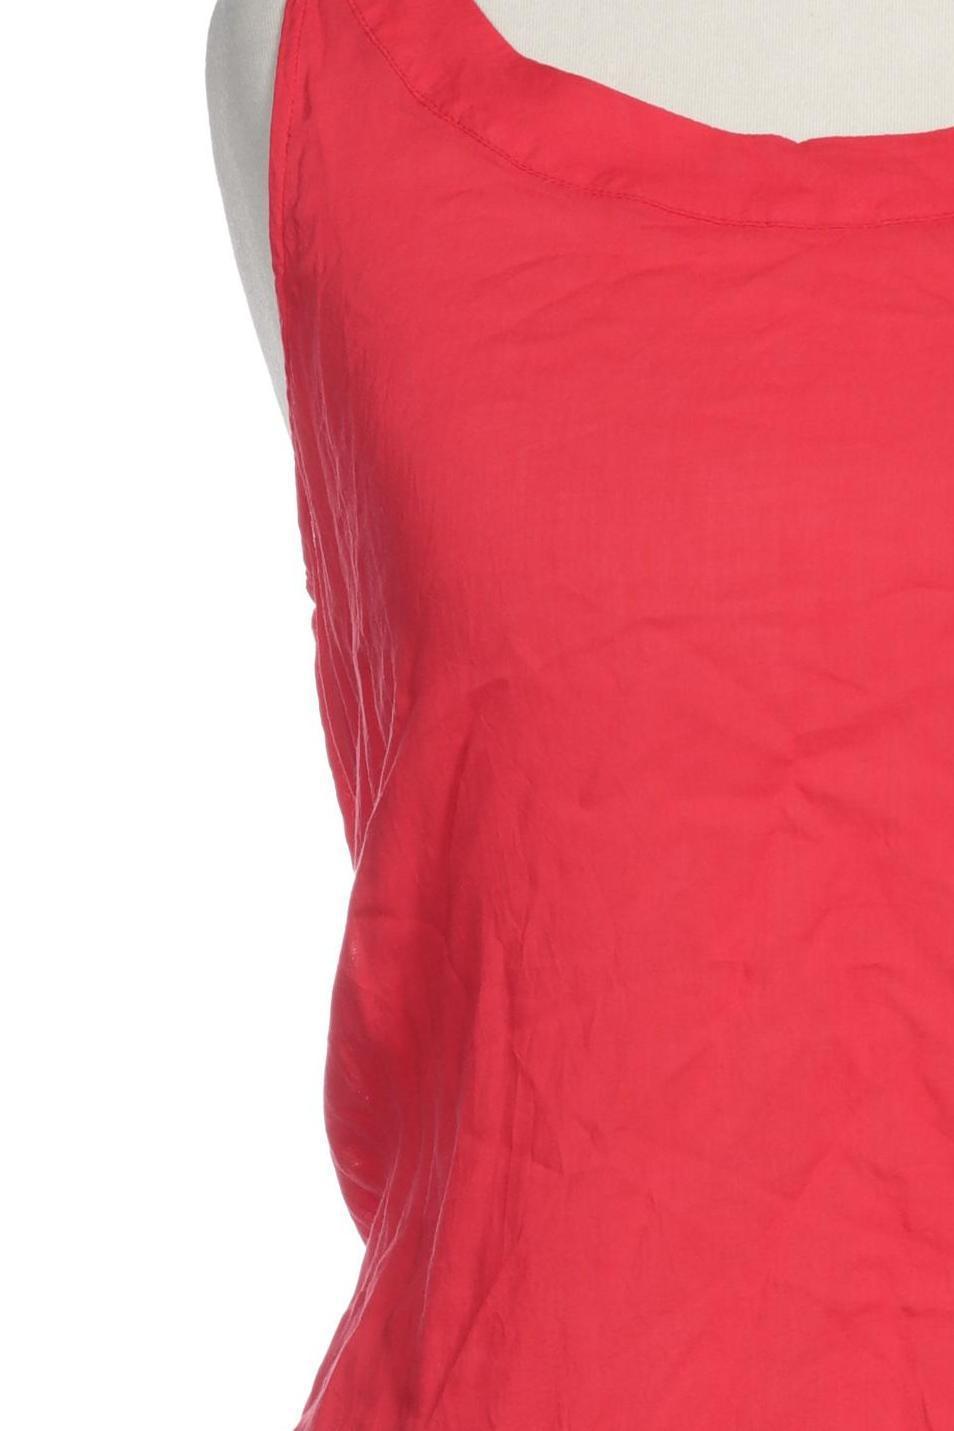 Drykorn Damen Top INT XS Second Hand kaufen mqnB1